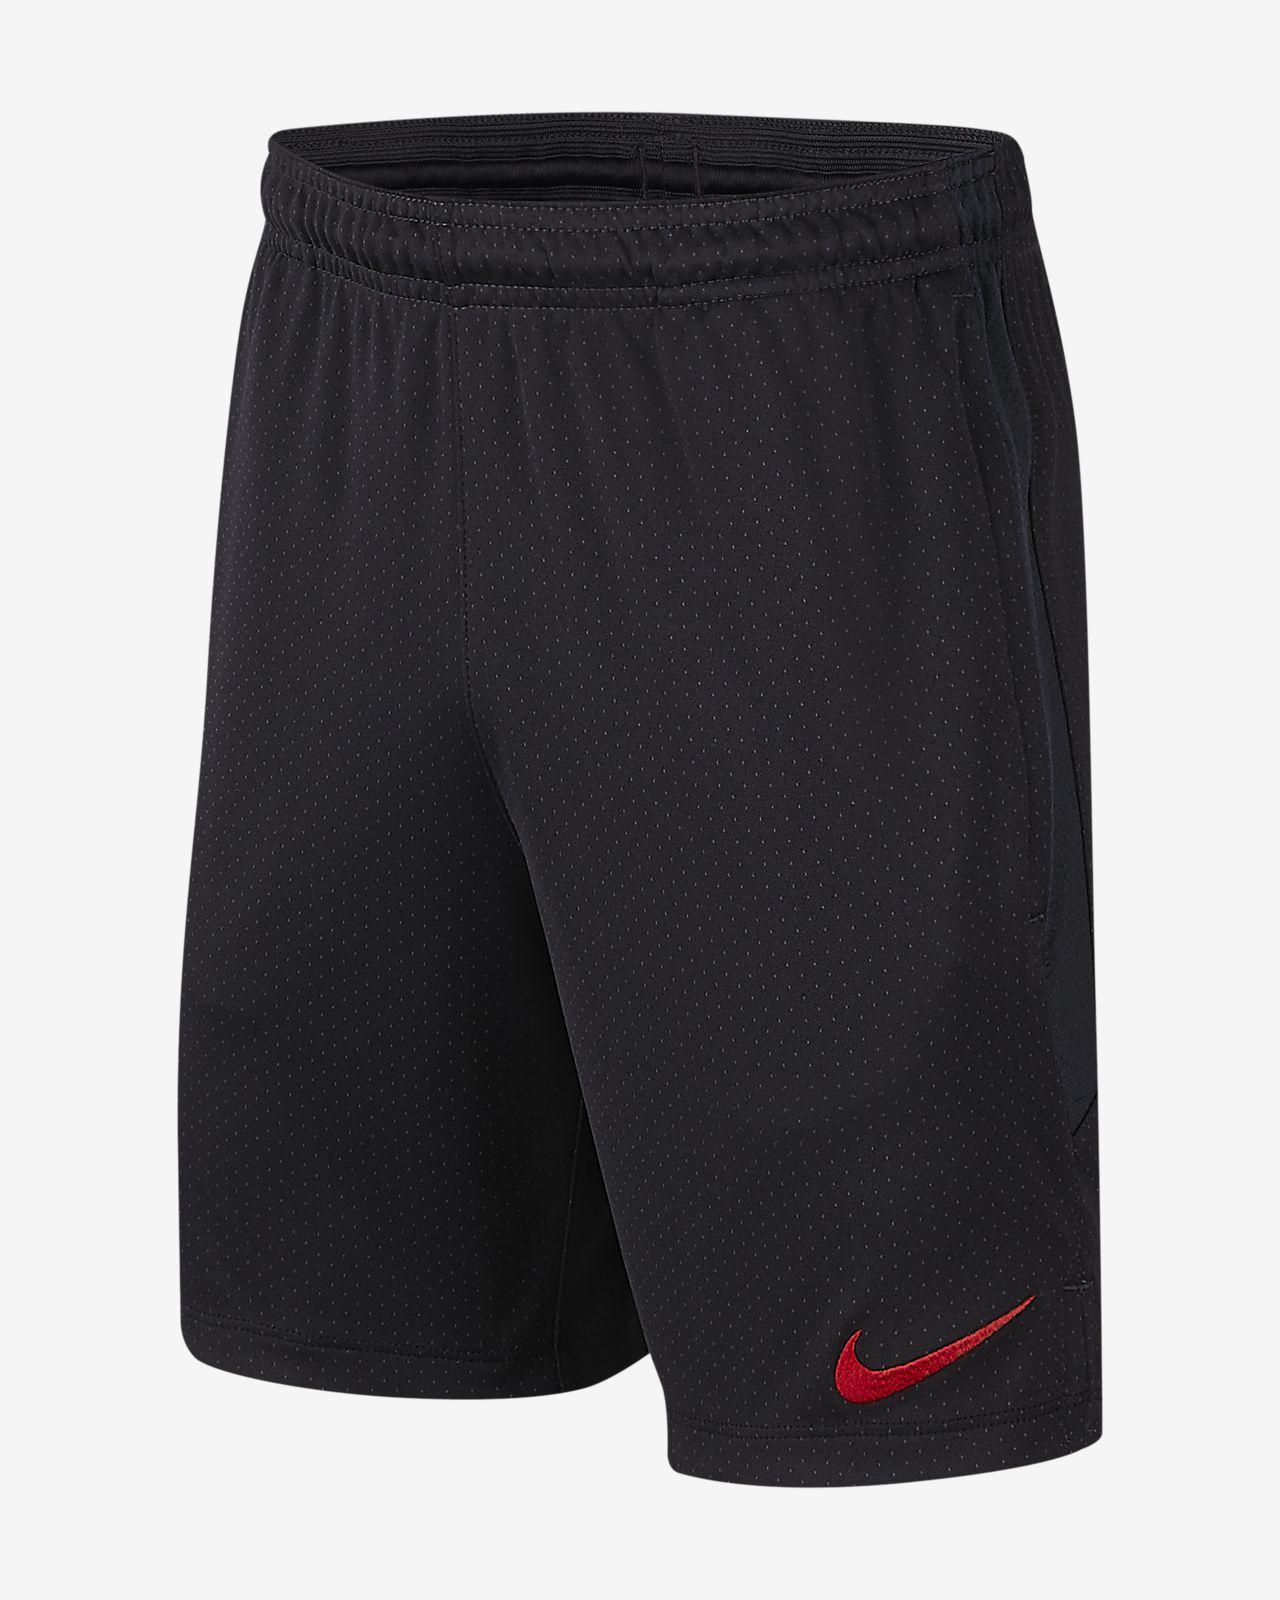 Shorts de fútbol para niño talla grande Nike Dri-FIT Paris Saint-Germain Strike